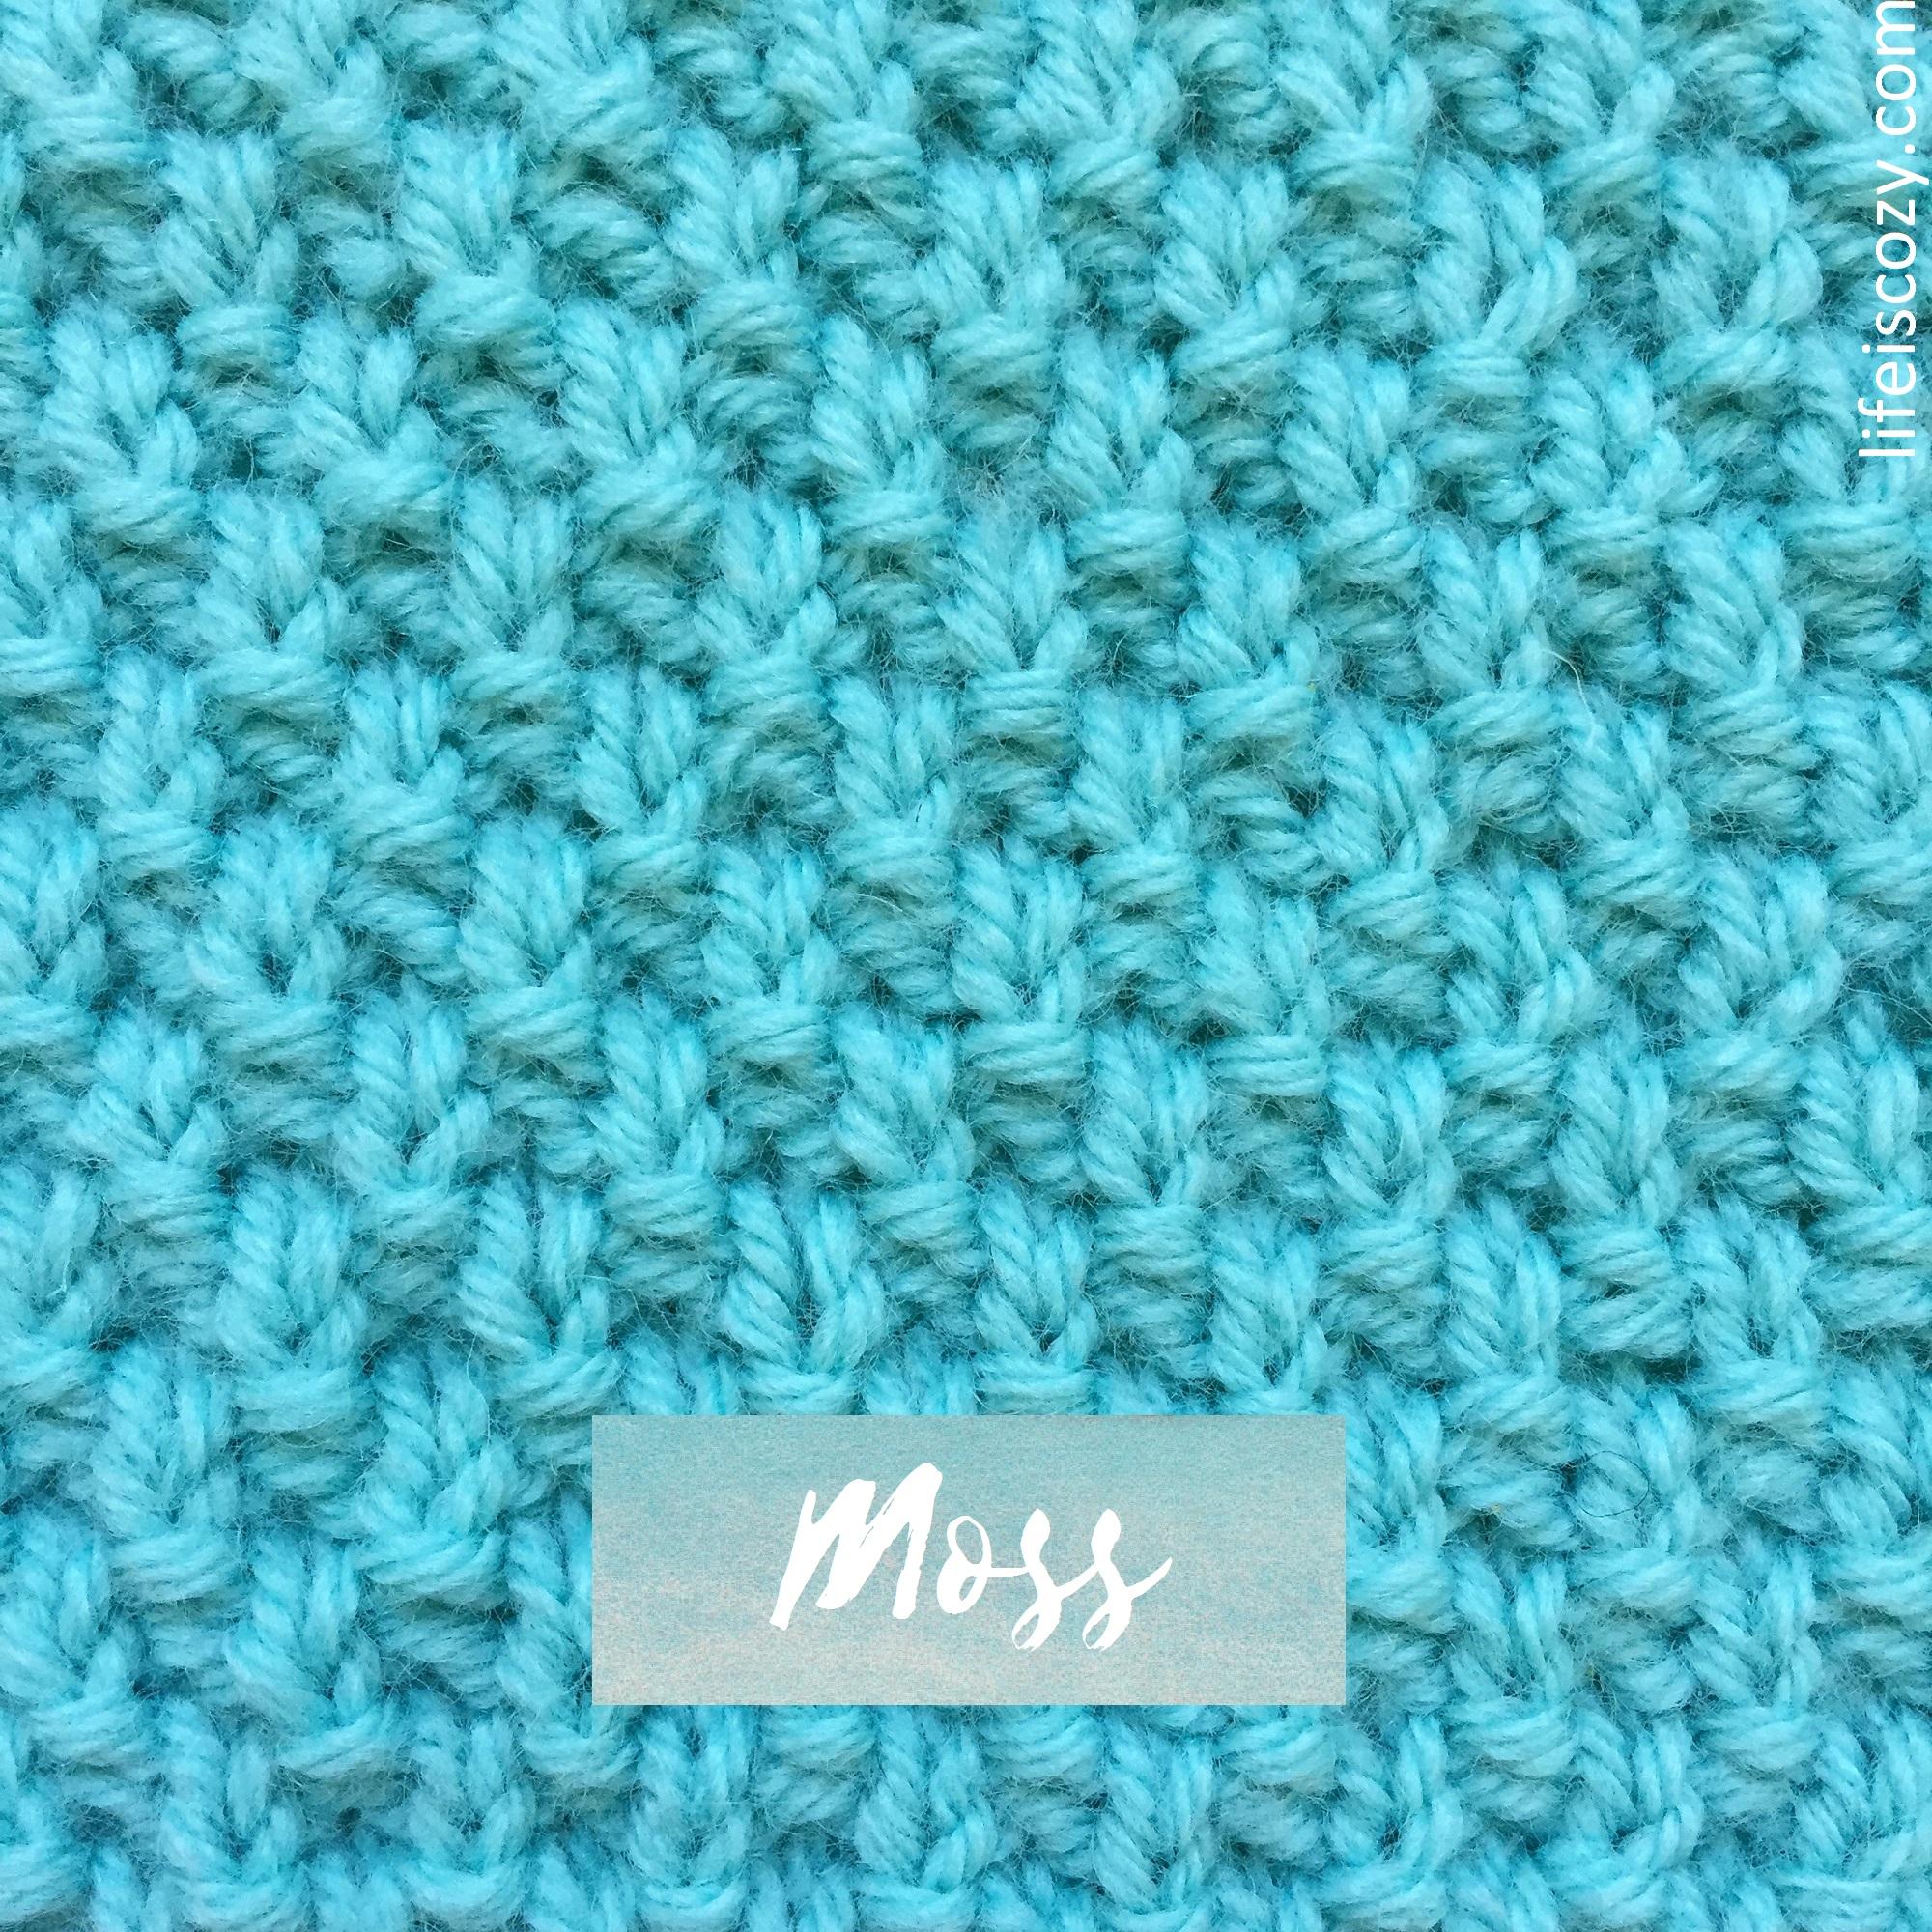 Moss Stitch How To knit